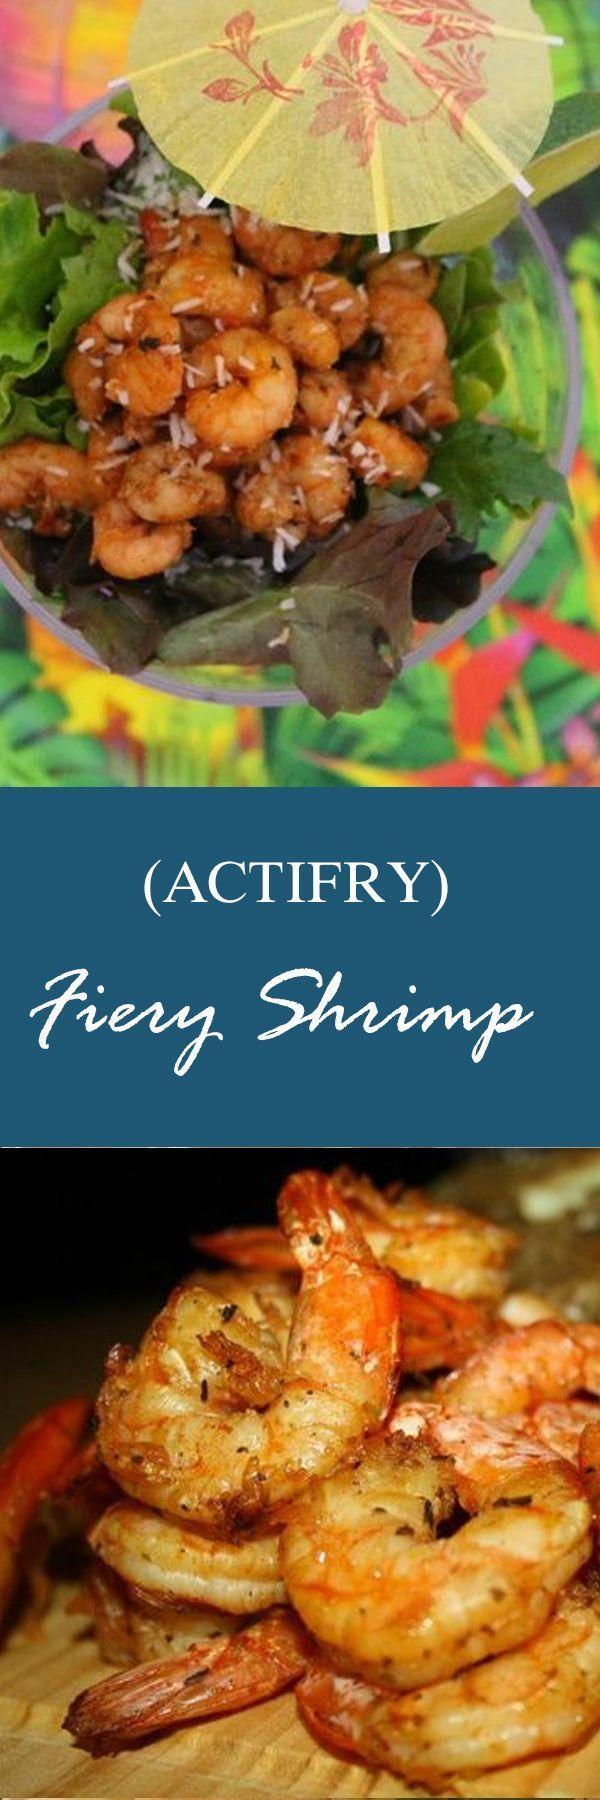 Fiery Shrimp - Actifry recipe. Simply heavenly! | recipezazz.com